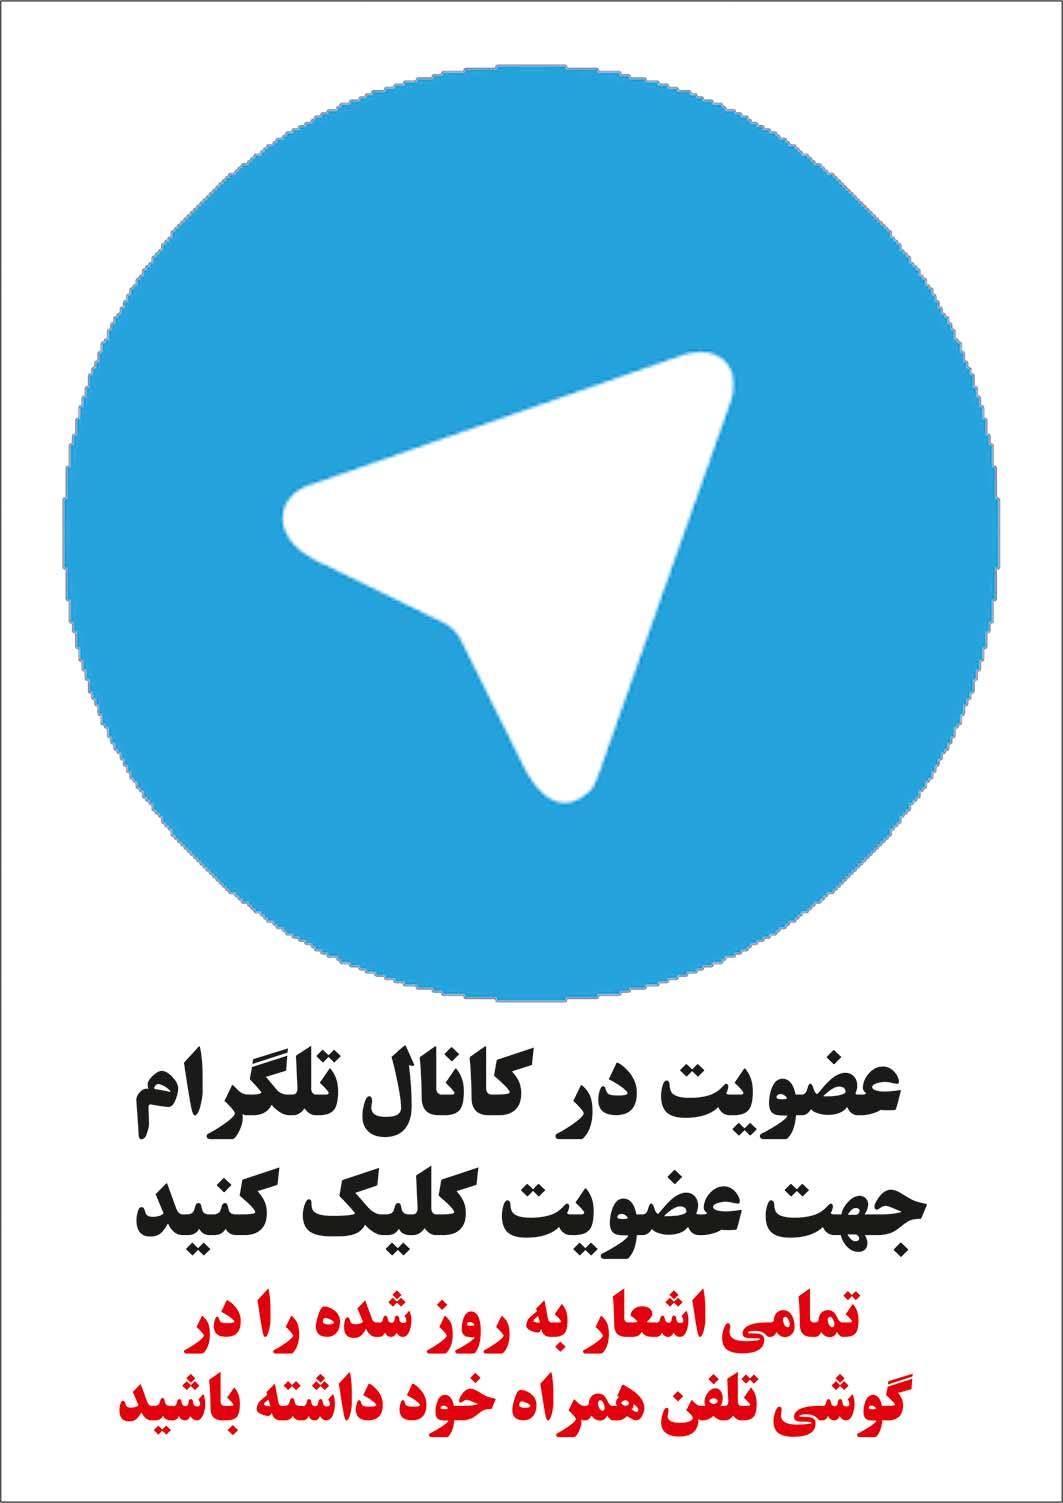 کانال+تلگرام+شعر+اهل+بیت